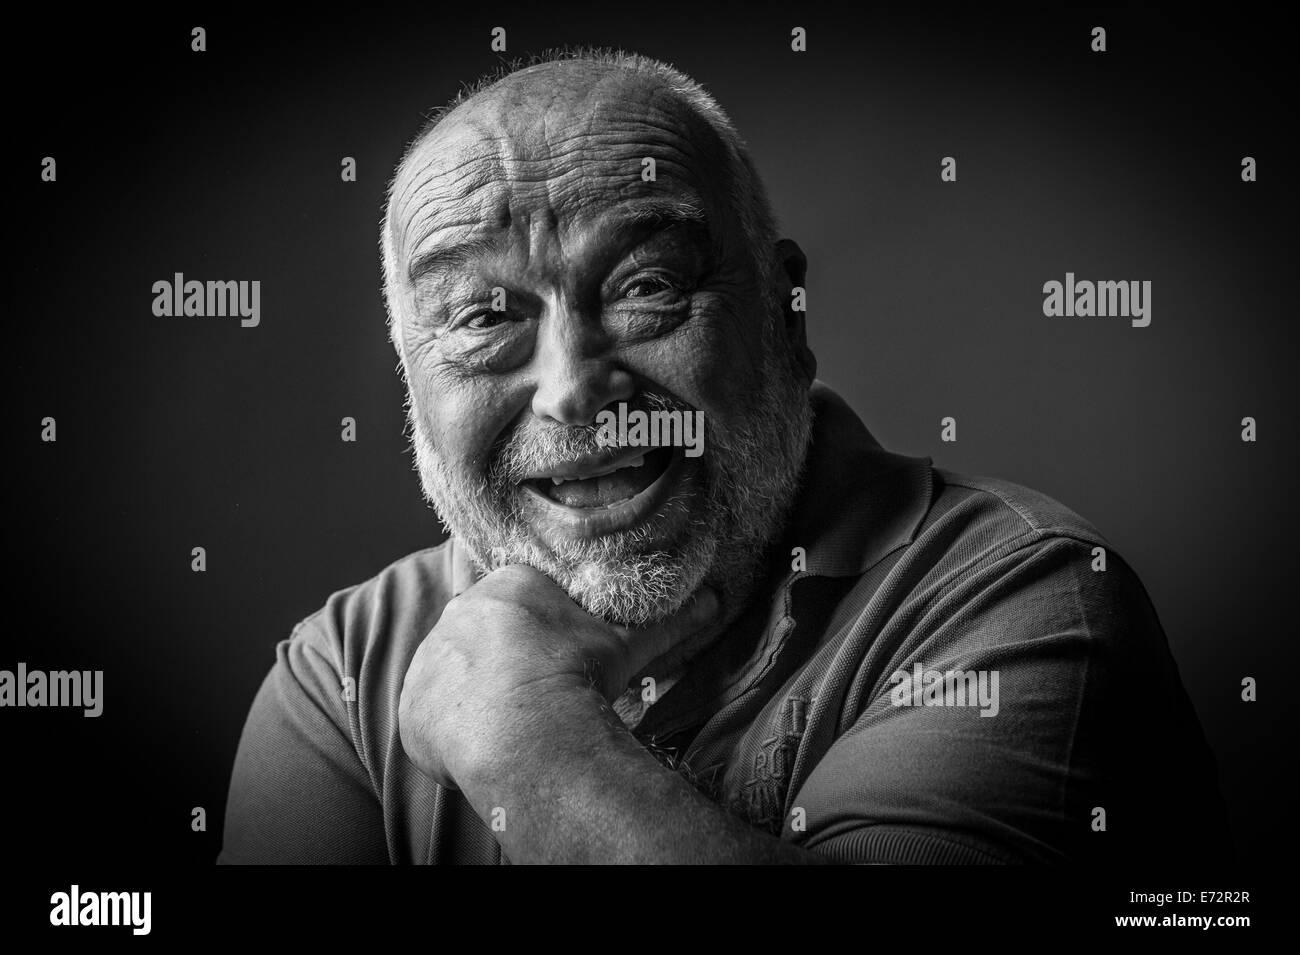 happy old man looking strange Stock Photo